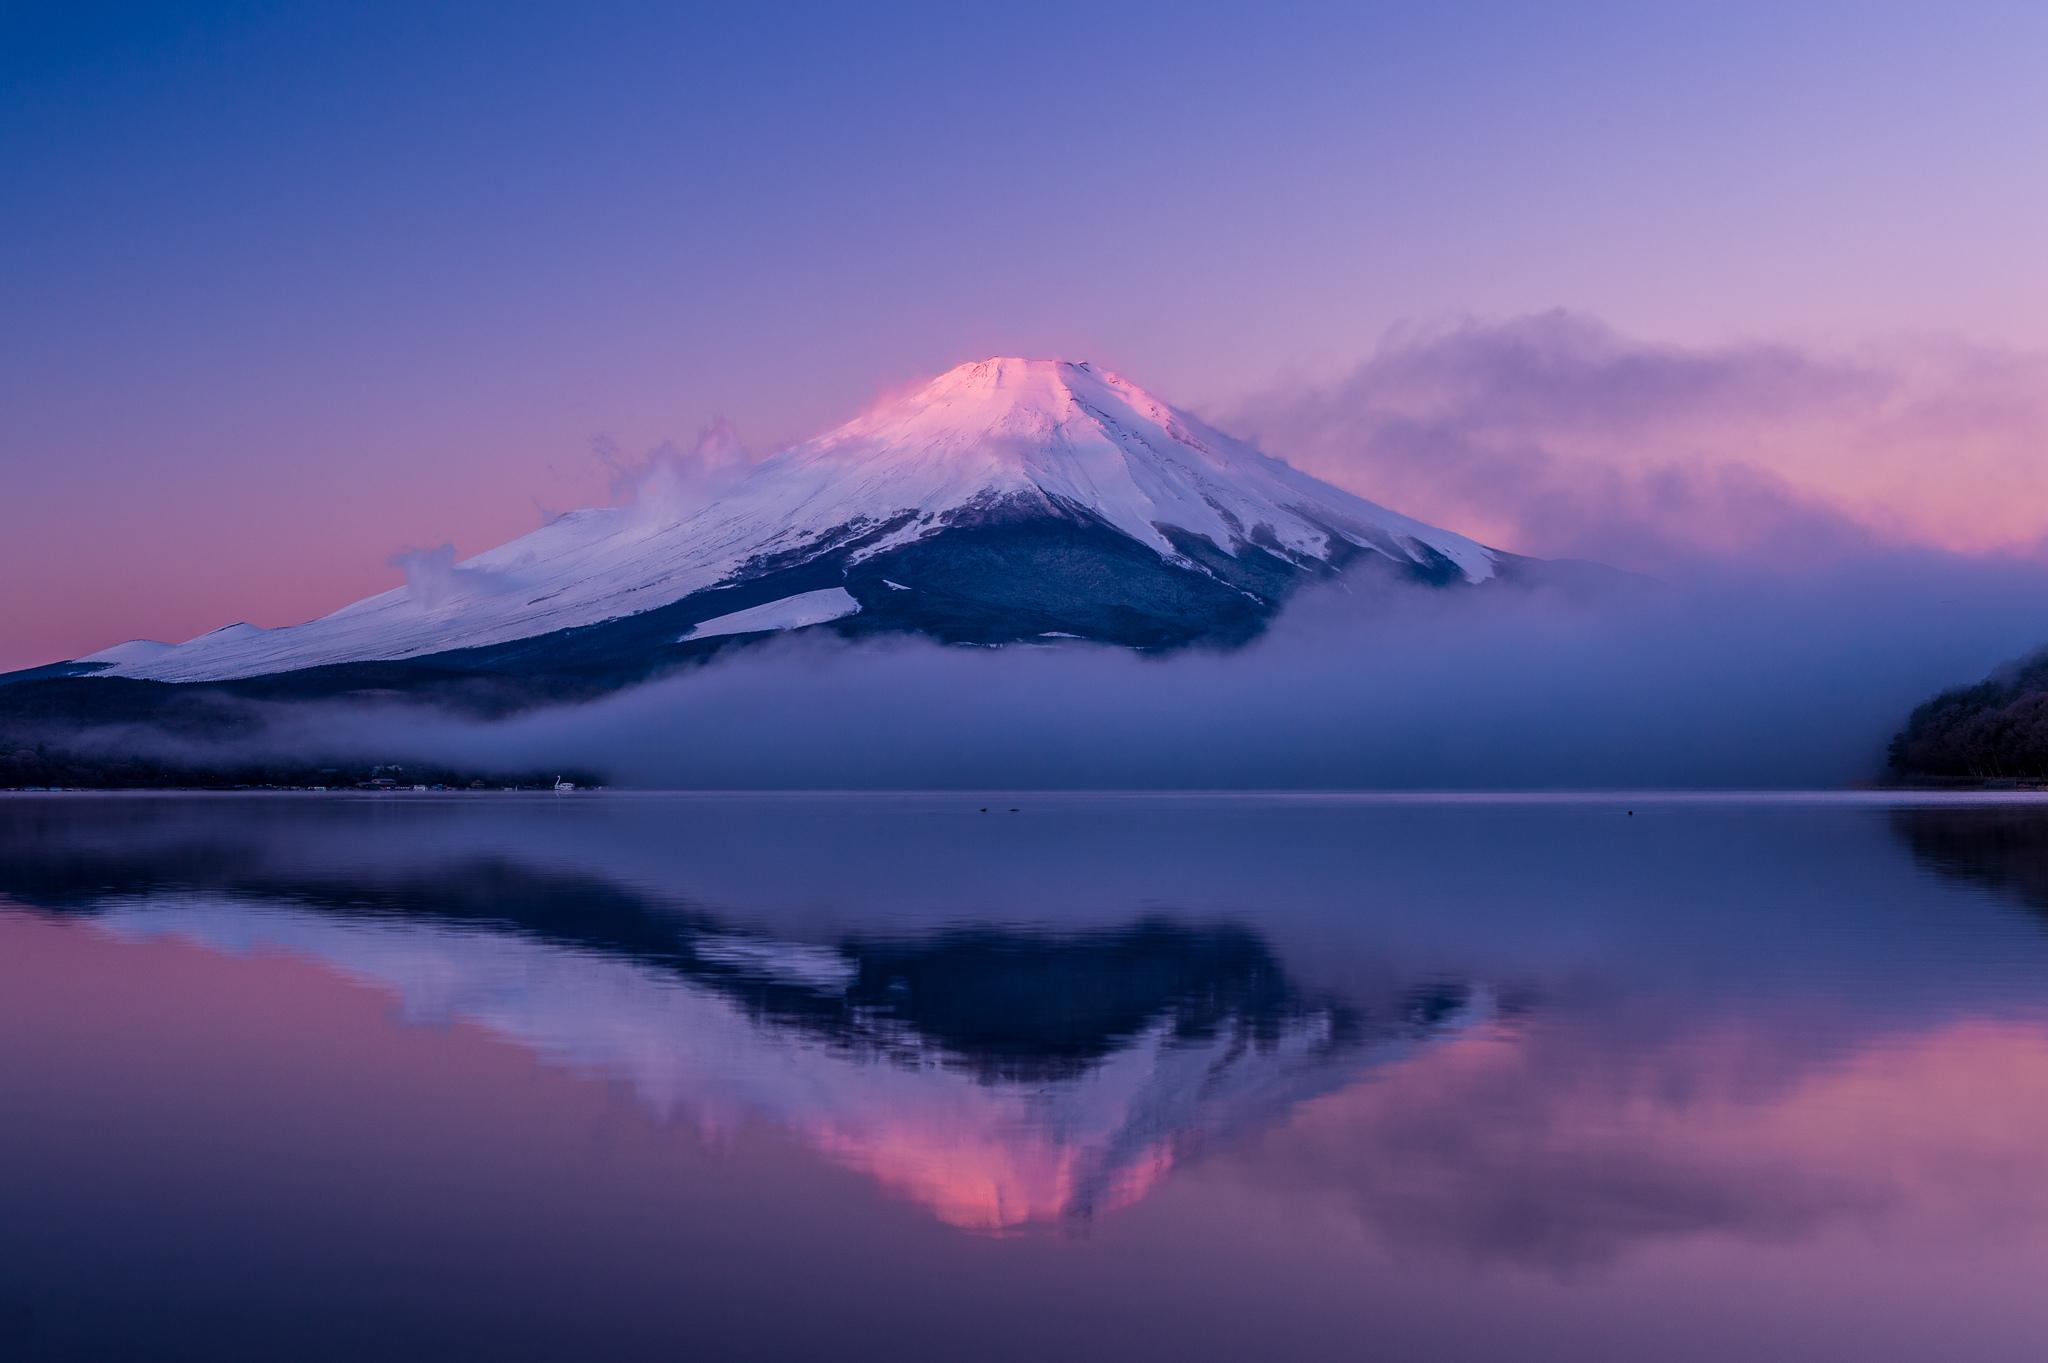 Mount Fuji HD Wallpaper Background Image 2048x1363 ID592781 2048x1363